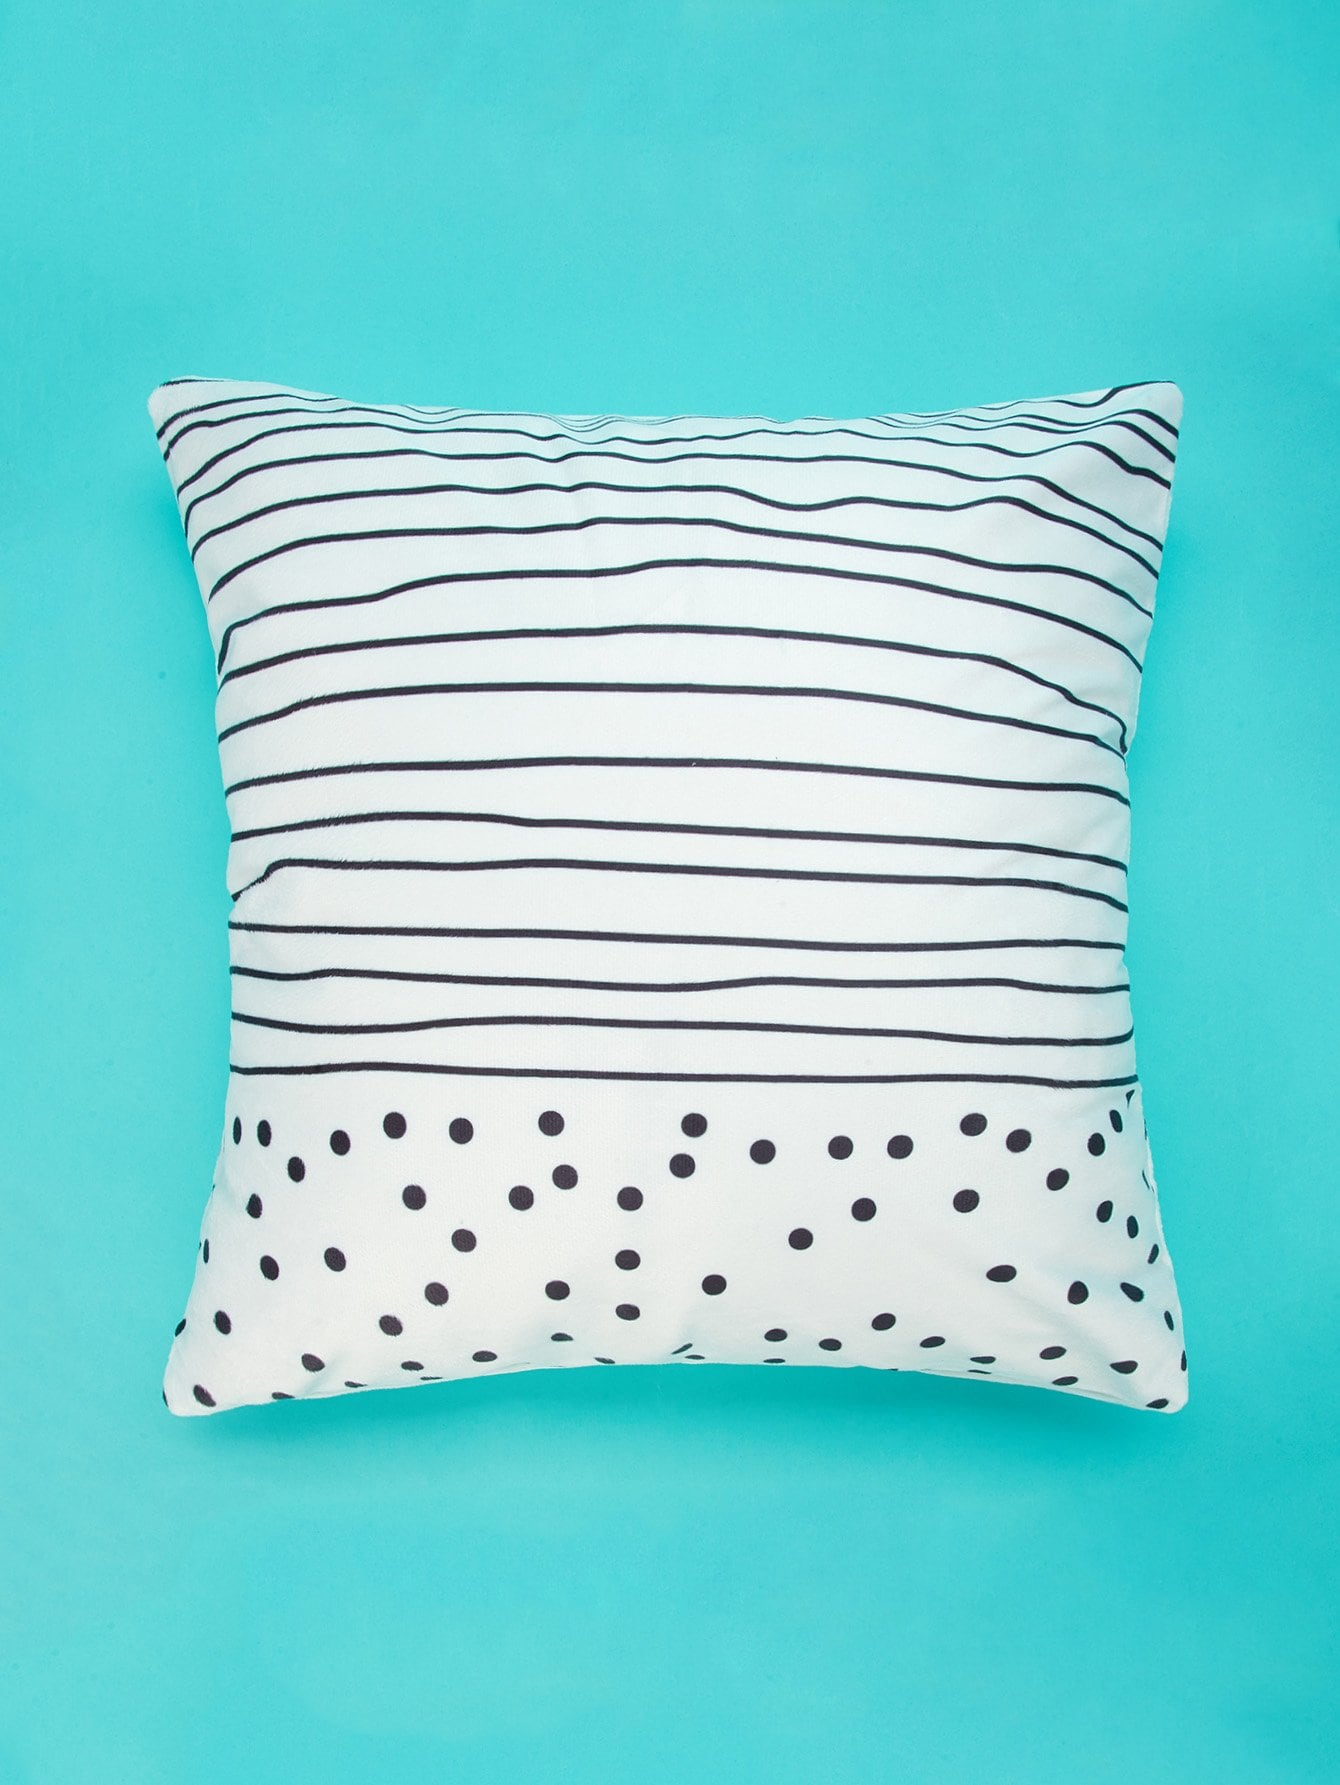 Striped & Polka Dot Print Pillowcase Cover 1PC